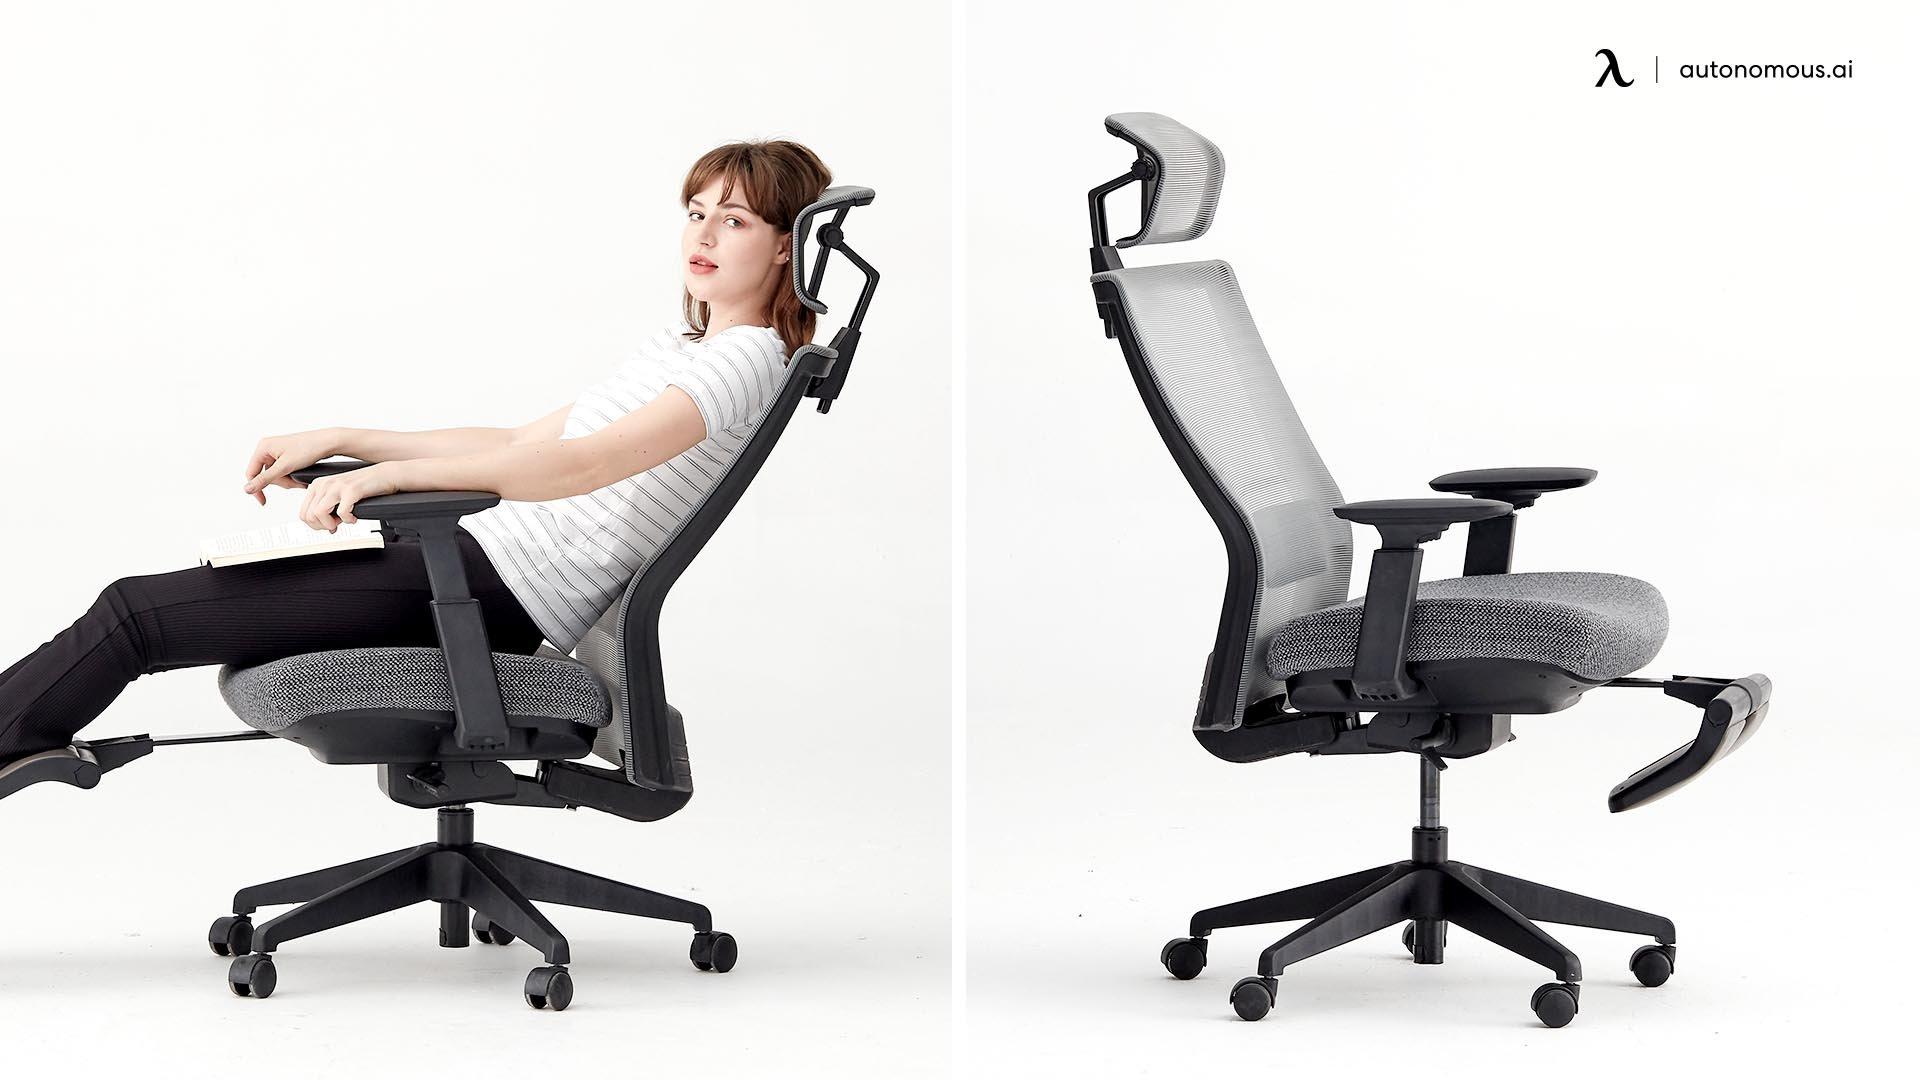 Backrest recline